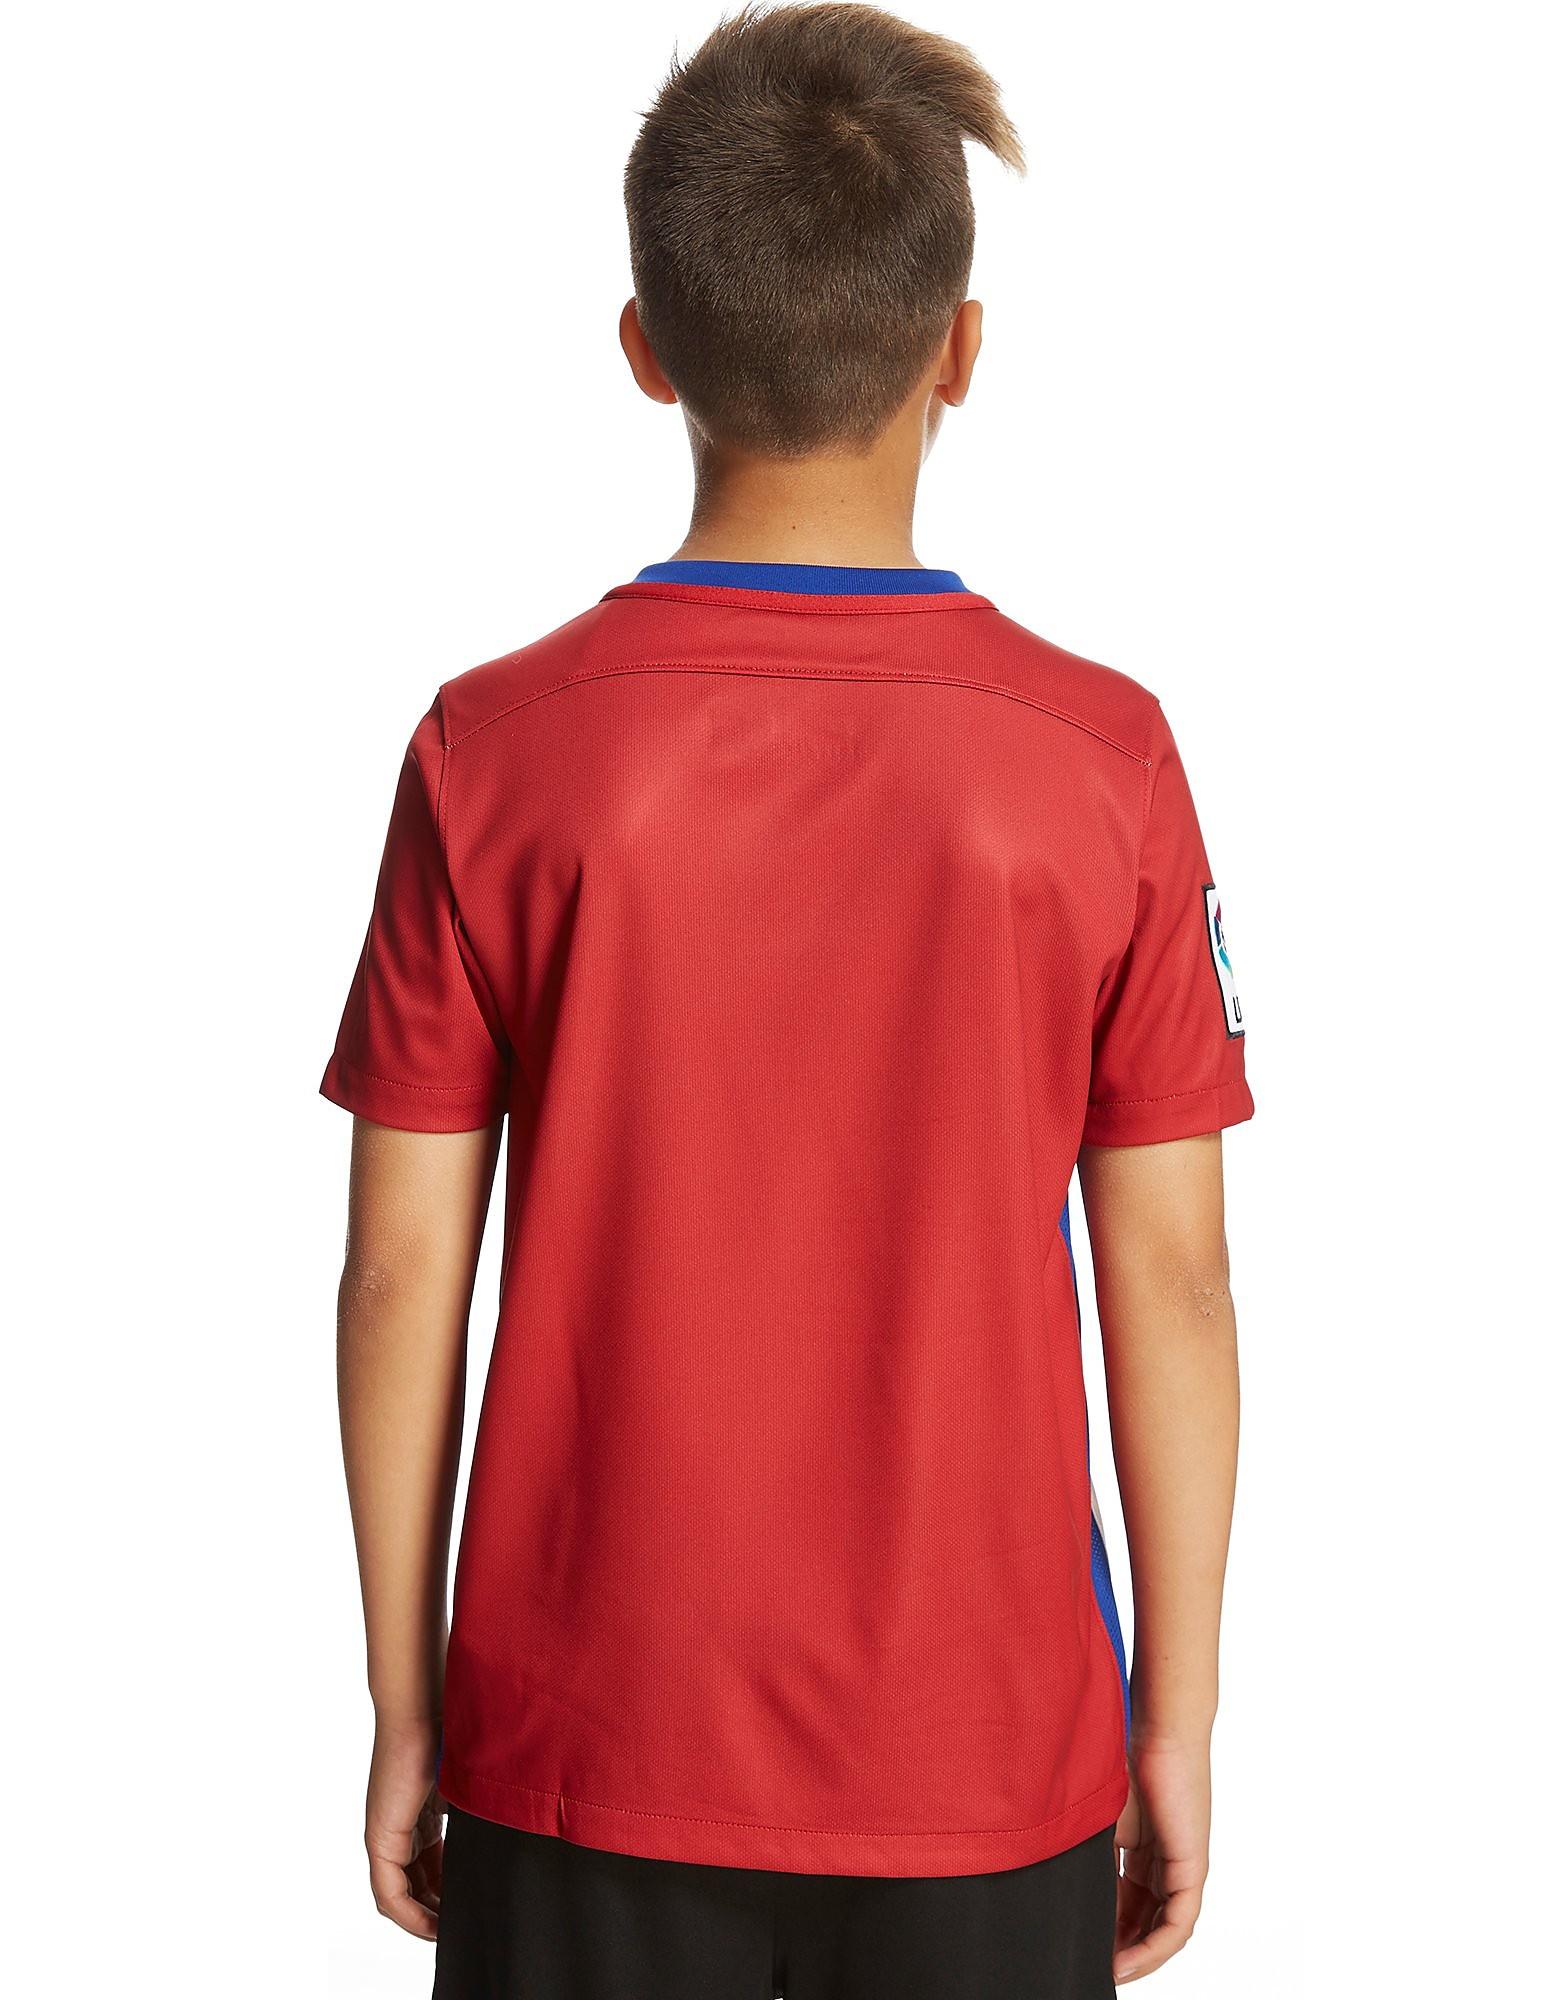 Nike Atletico Madrid Home 2015 Shirt Junior